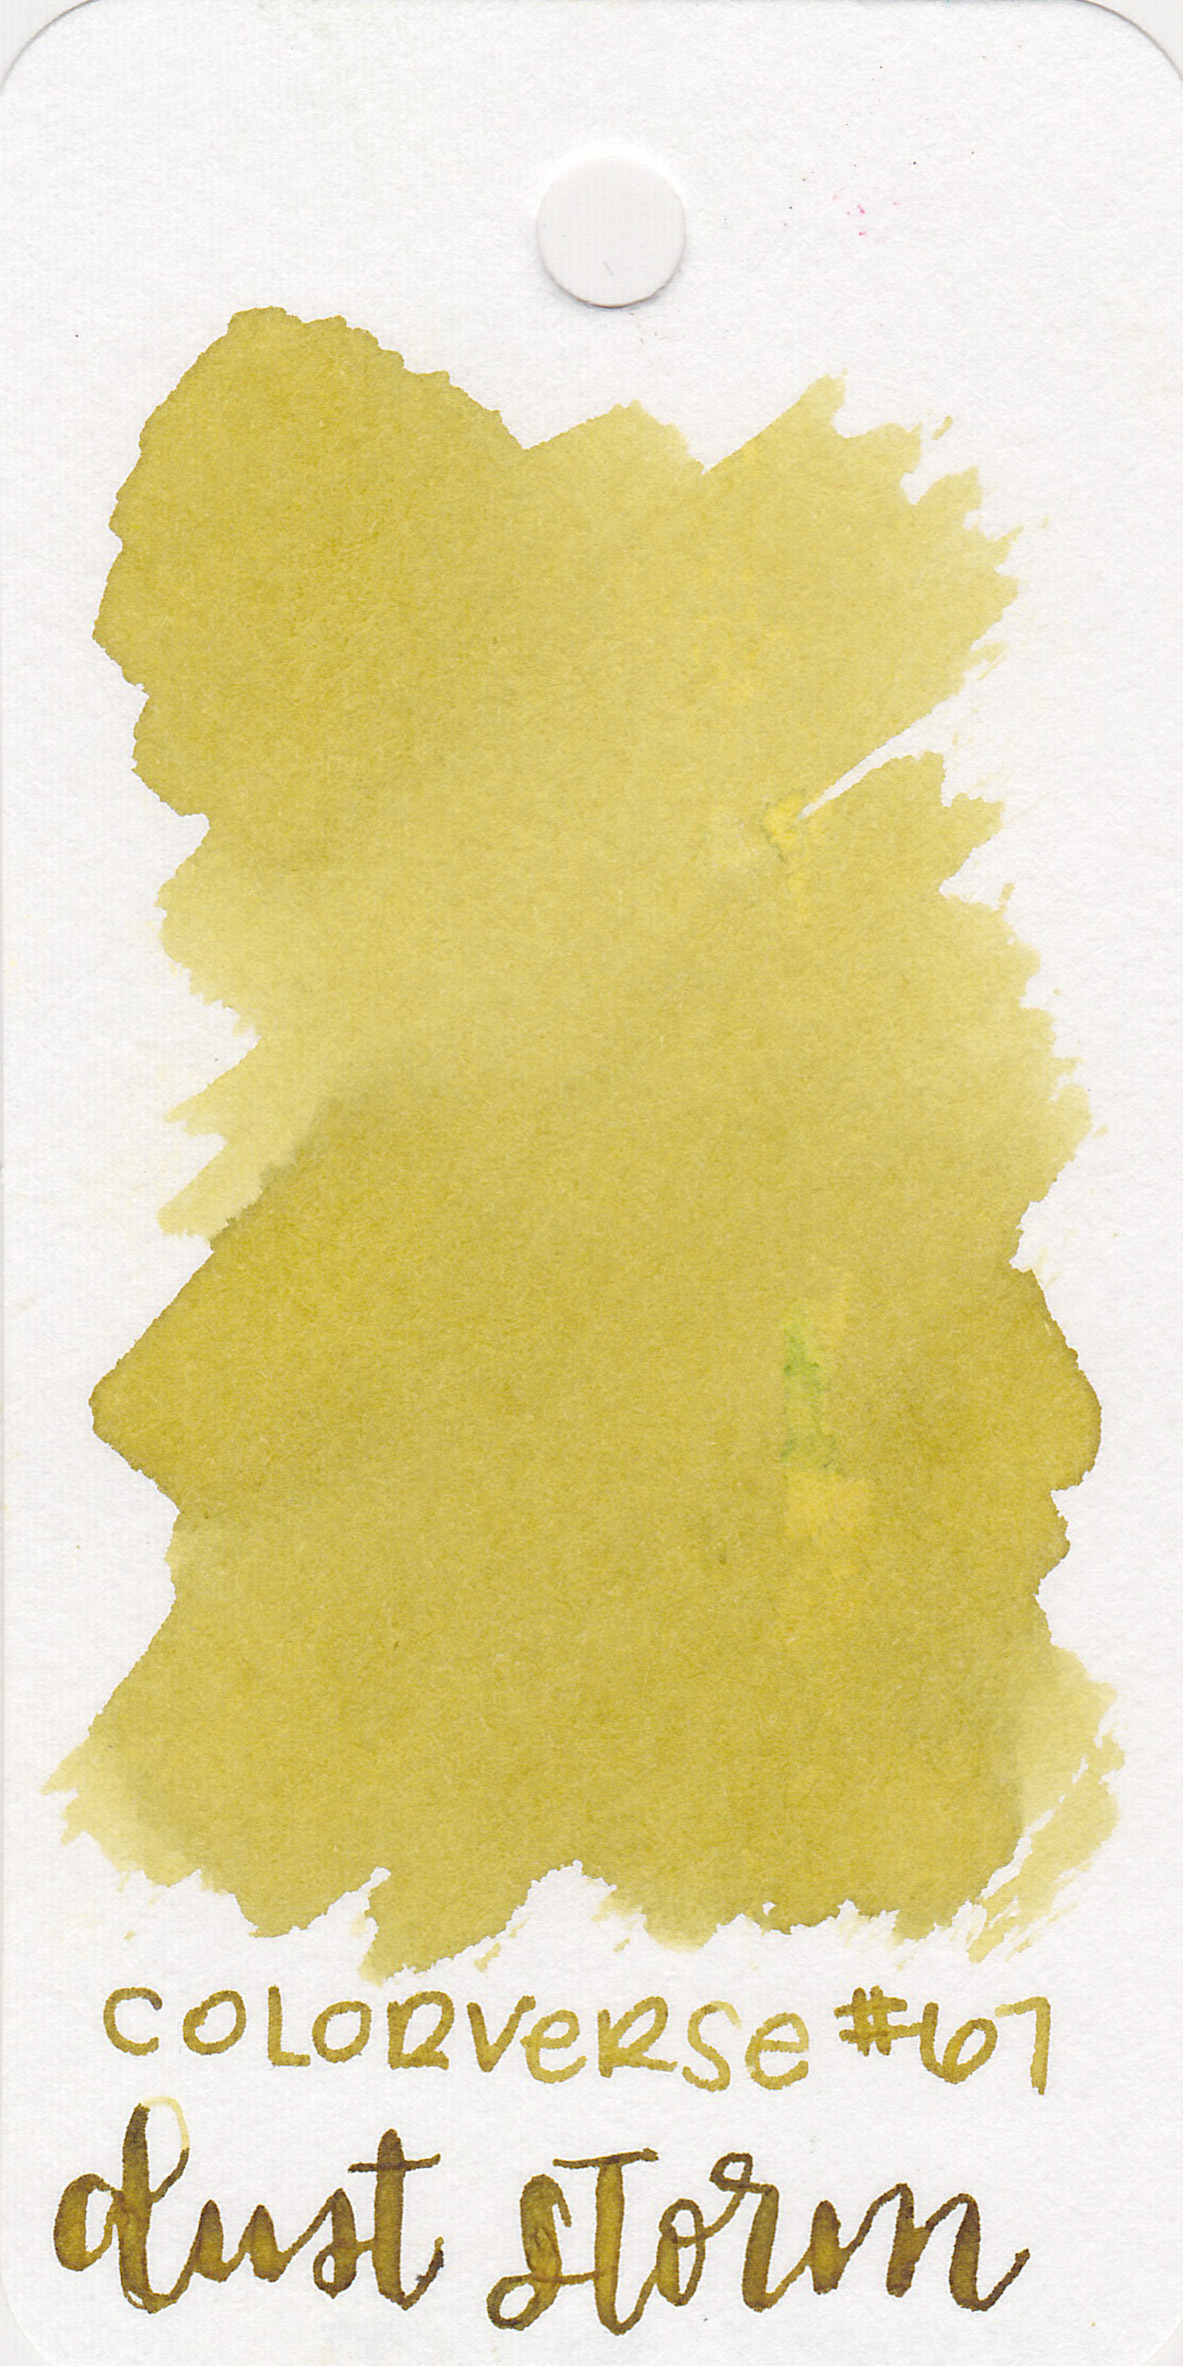 cv-dust-storm-1.jpg